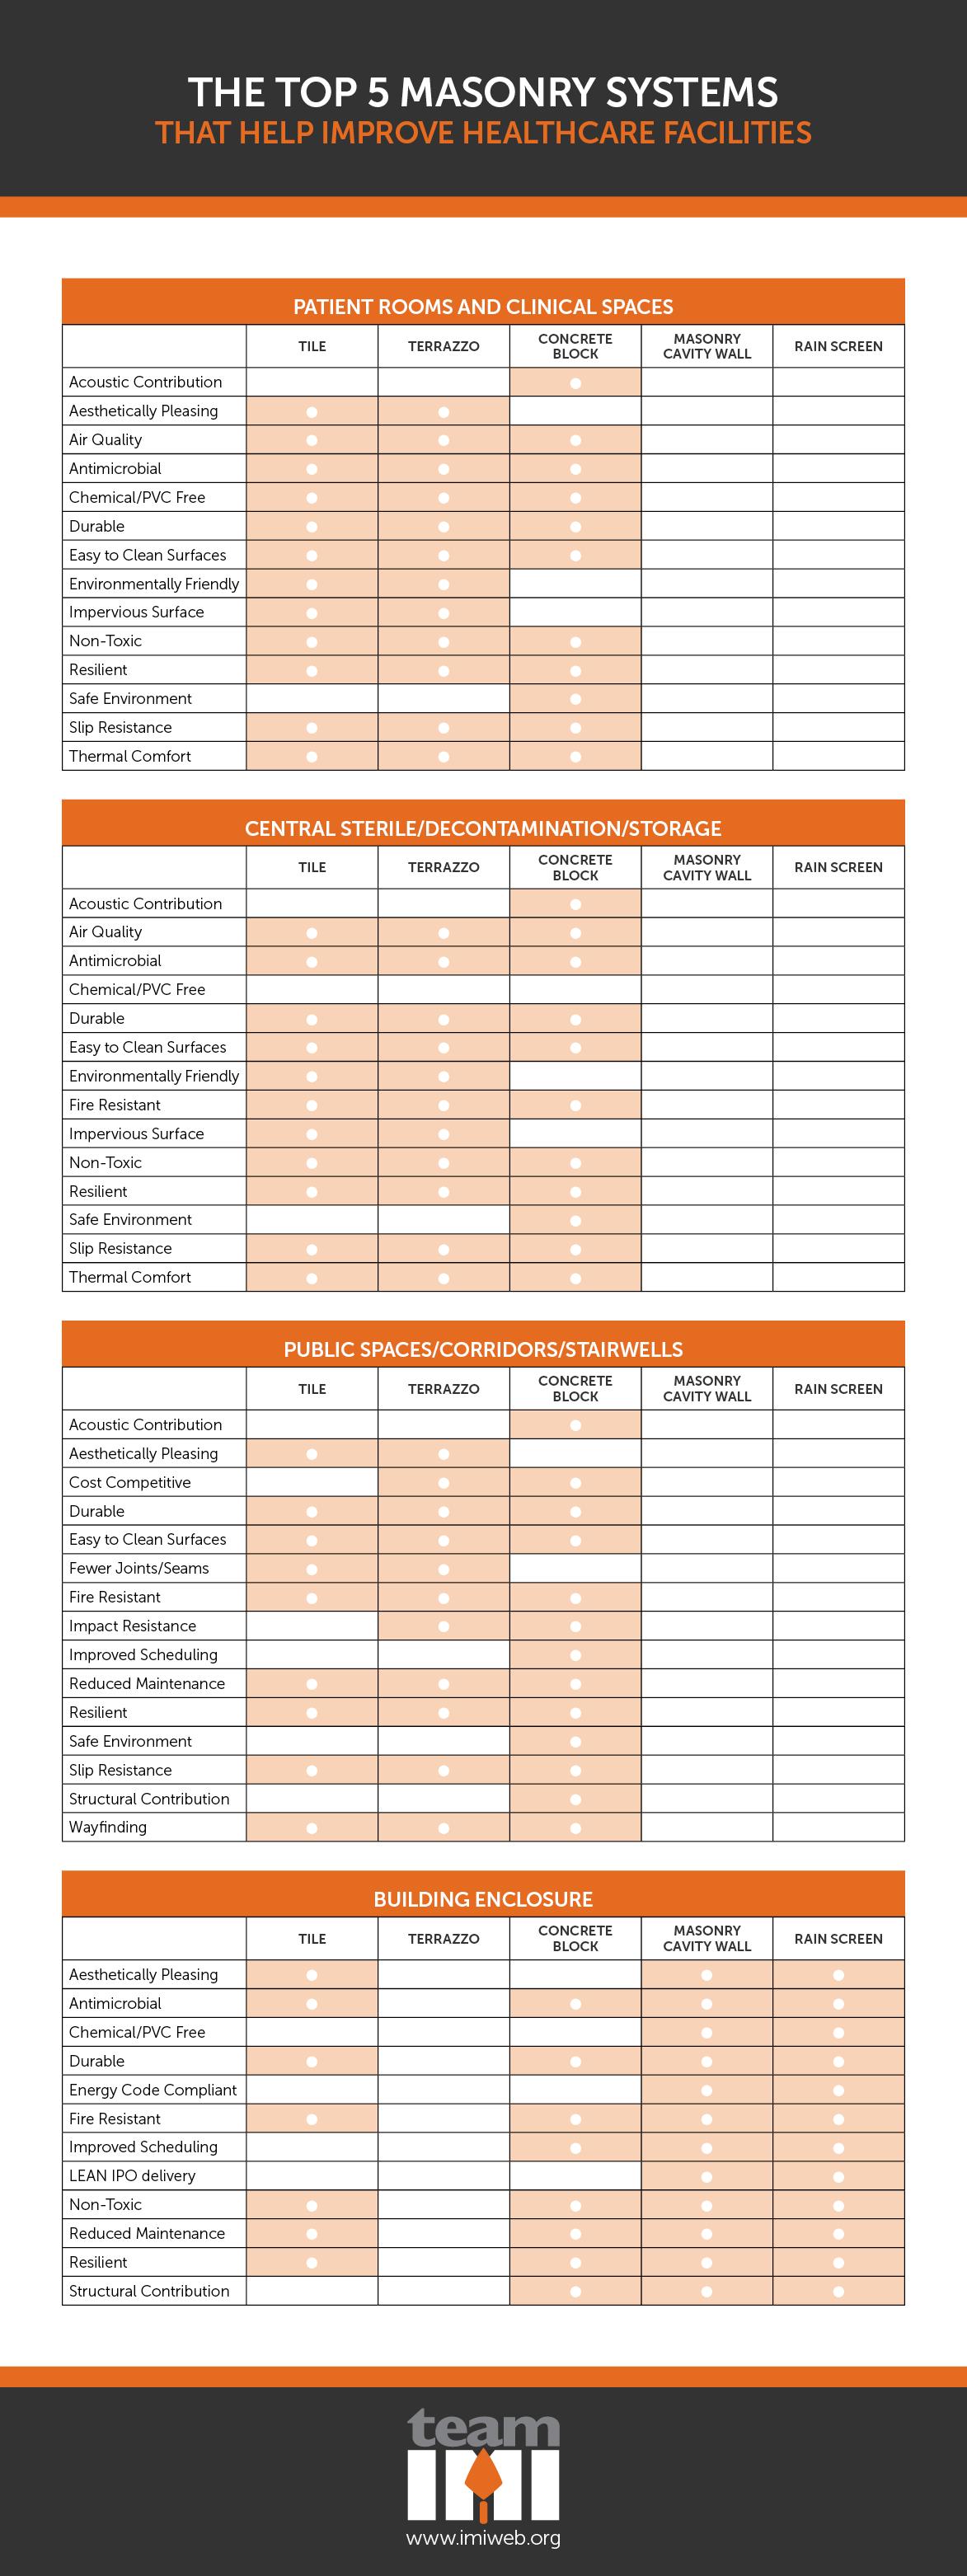 Healthcare_Masonry_Systems_Table